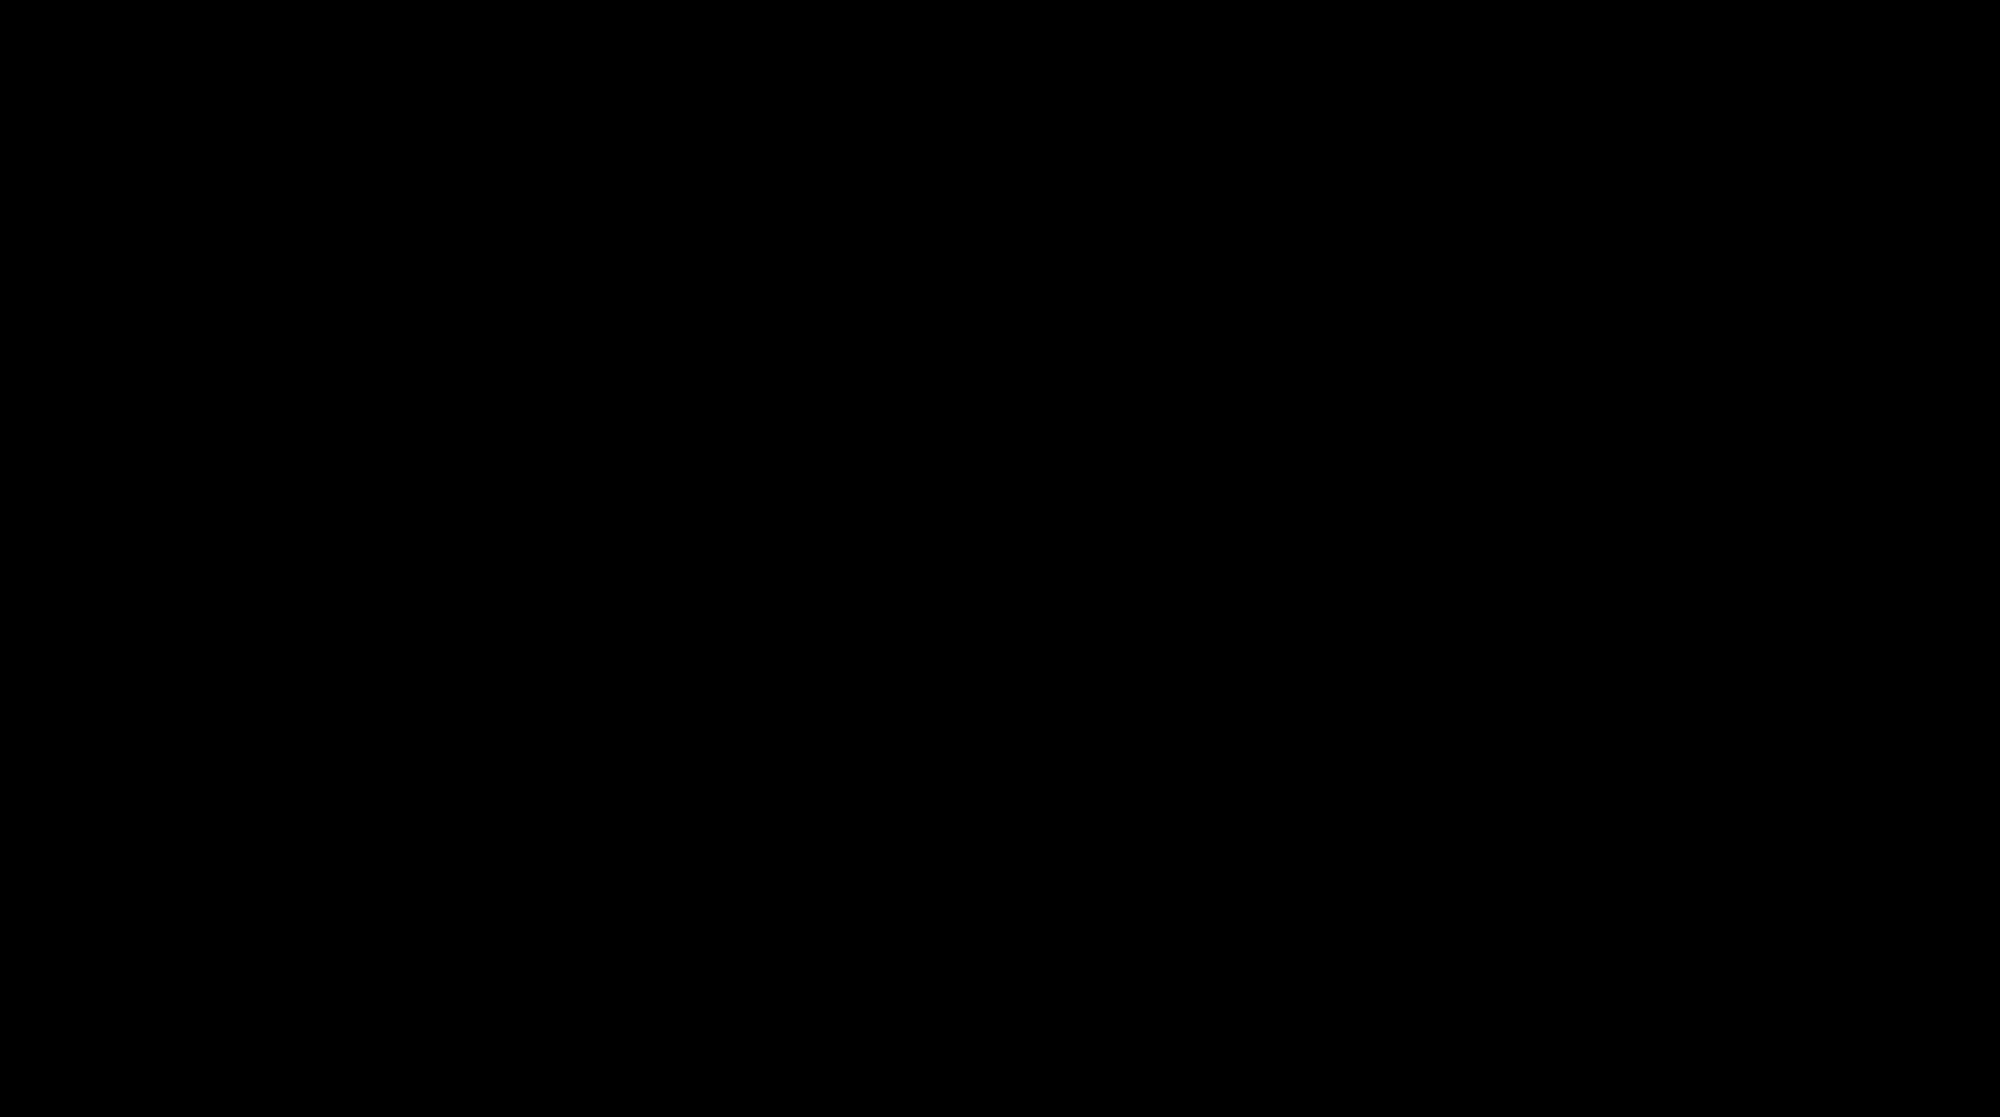 Perindopril